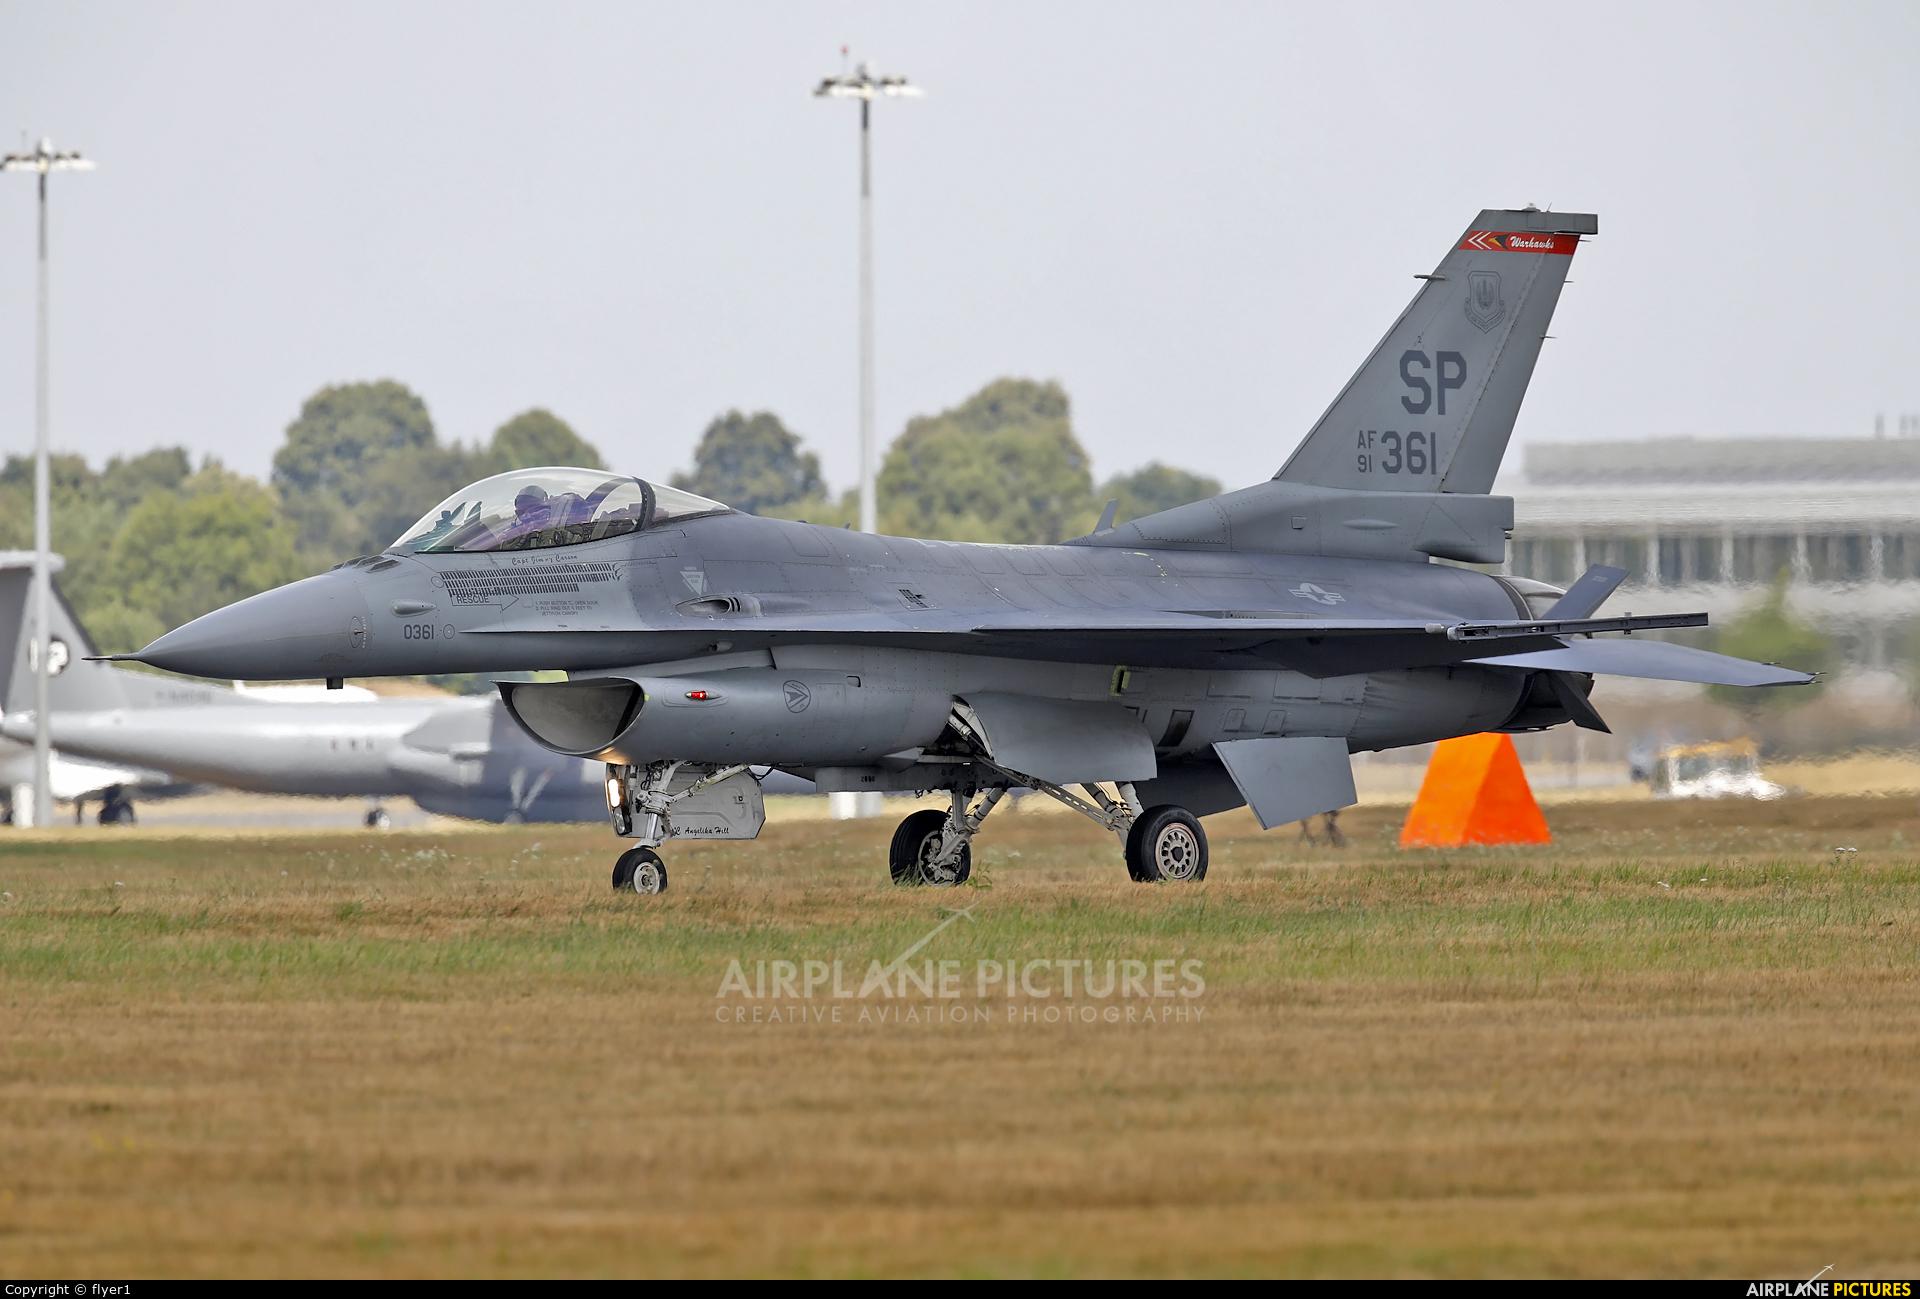 USA - Air Force 91-0361 aircraft at Farnborough